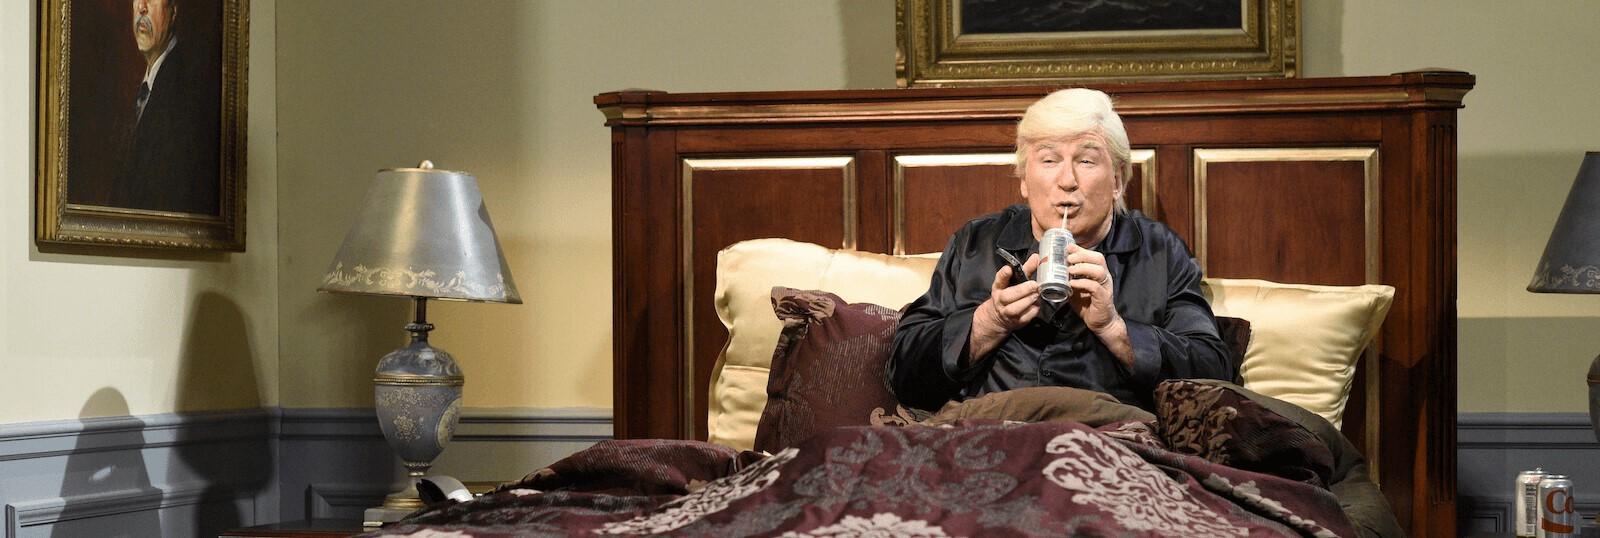 Alec Baldwin as President Donald Trump on Saturday Night Live (Photo: Will Heath/Getty)